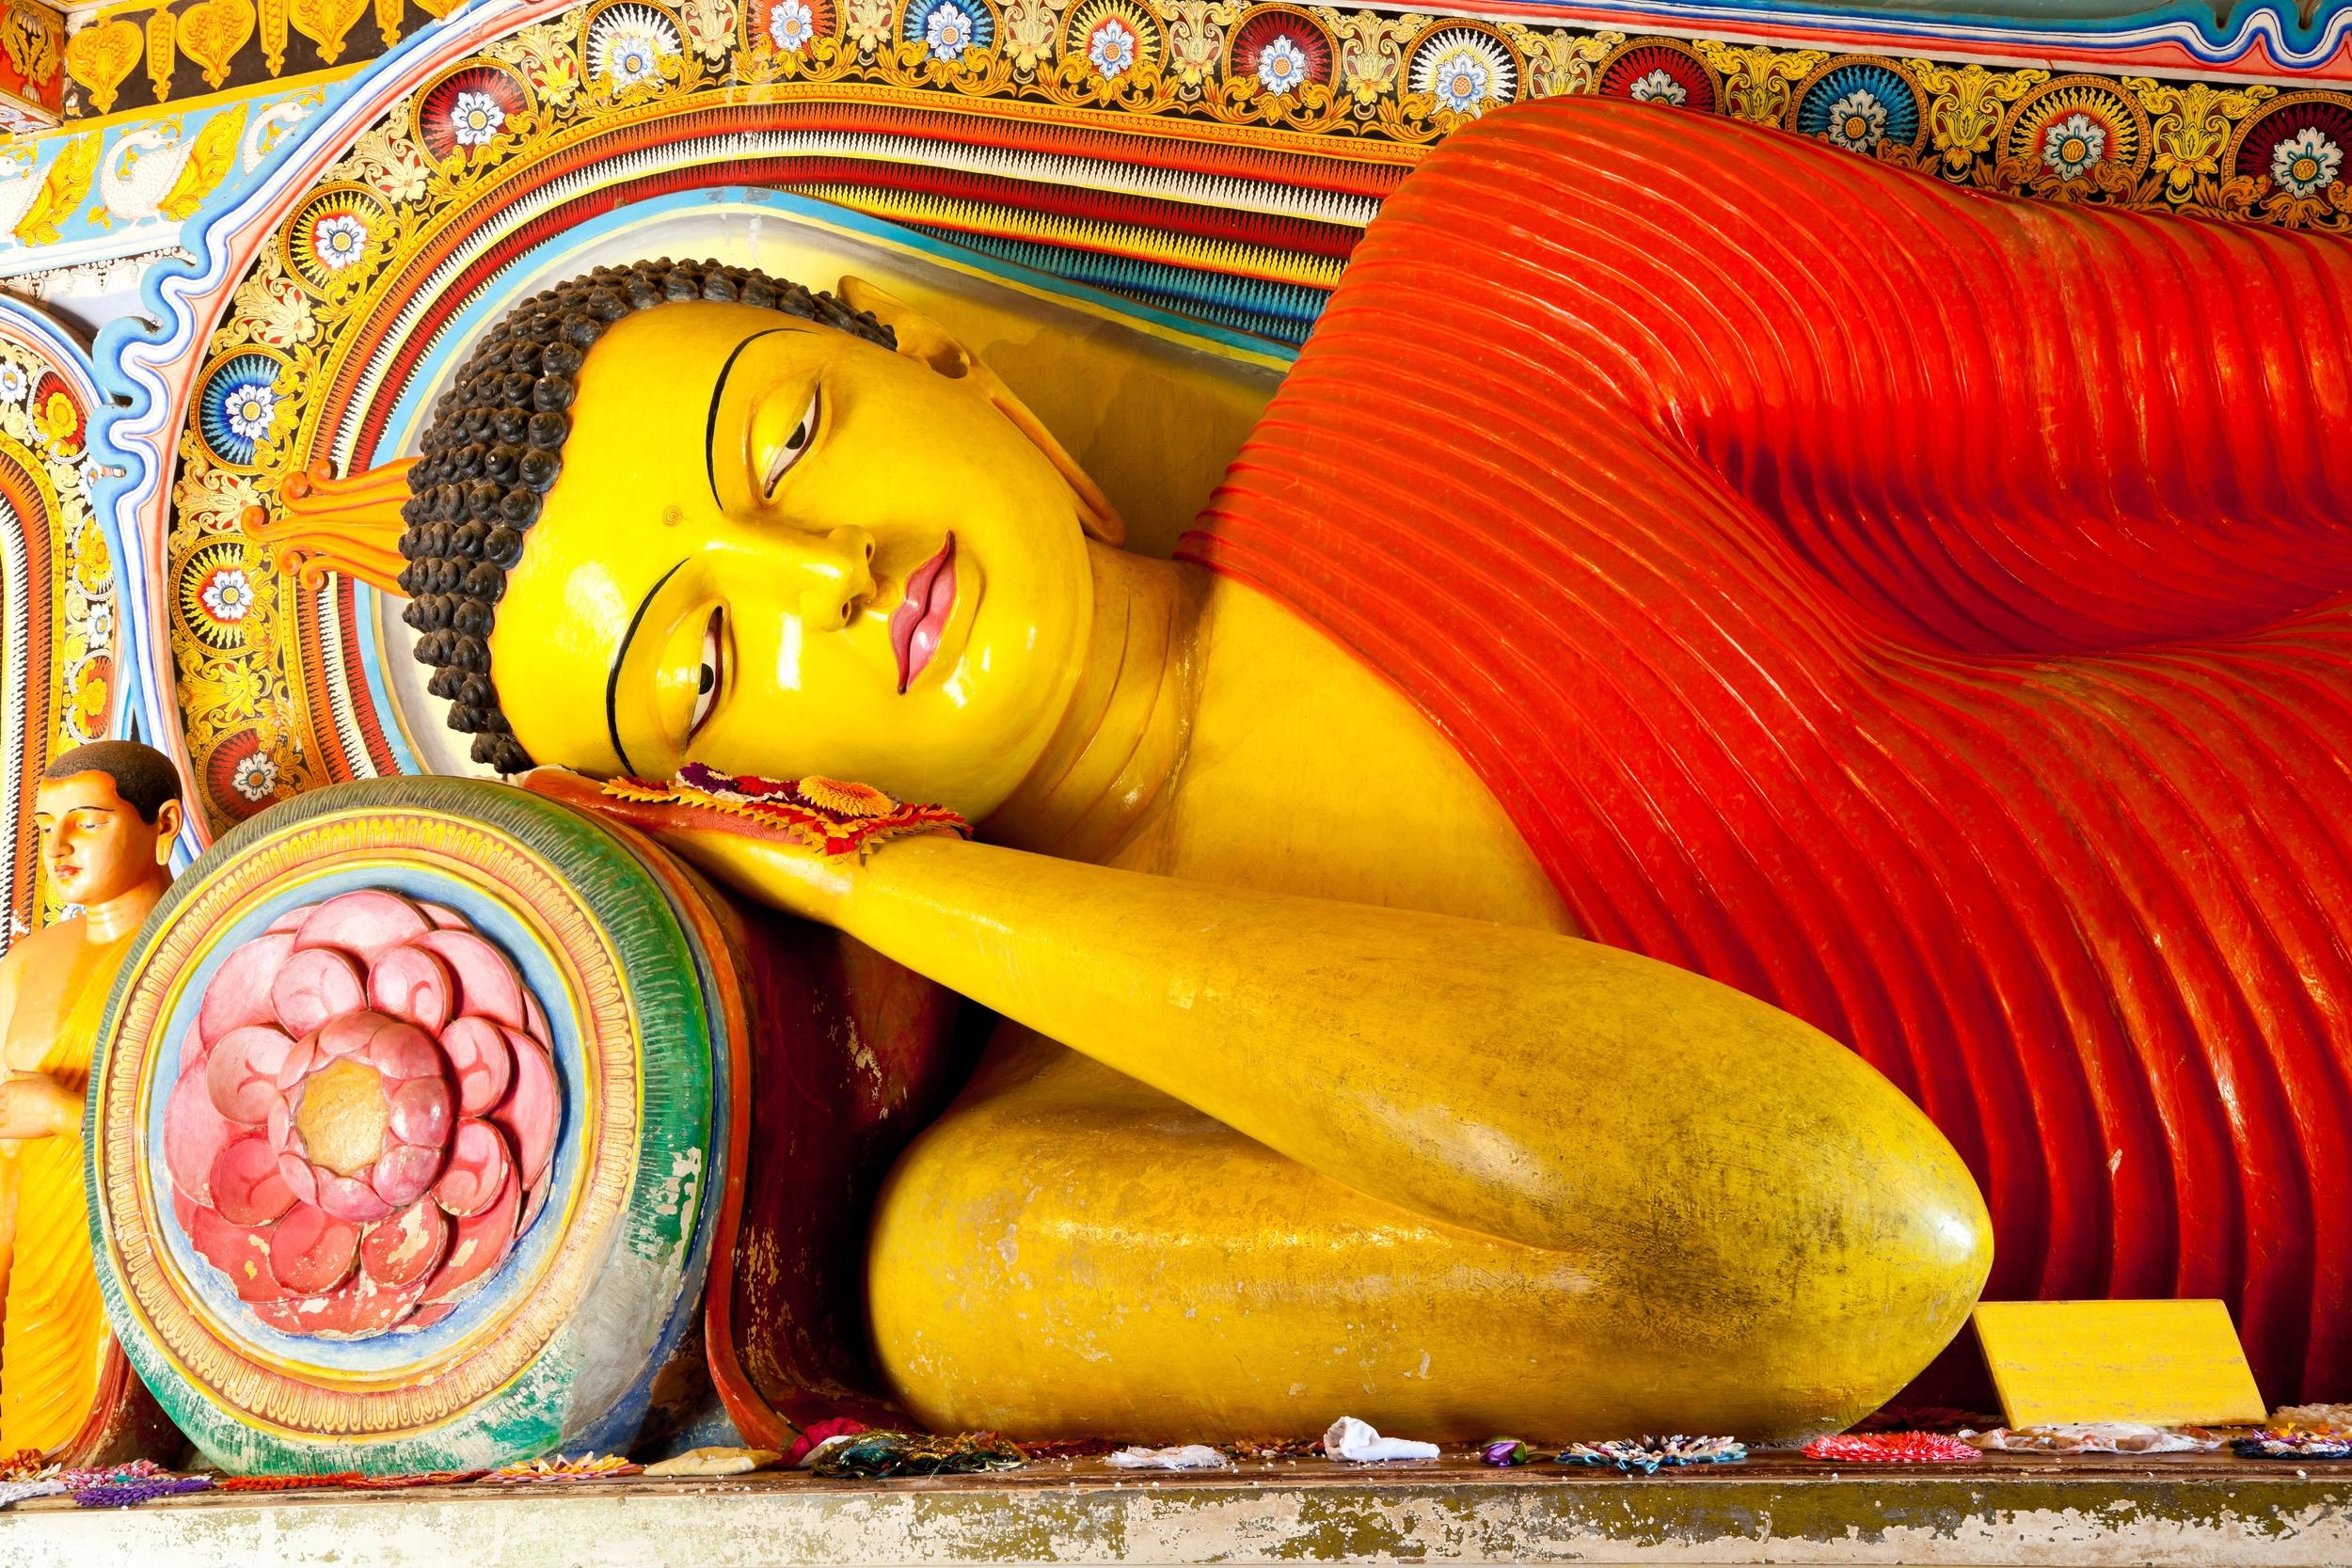 invite-to-paradise-sri-lanka-holiday-honeymoon-cultural-triangle-dambulla-cave-temple-buddha-1b.jpg